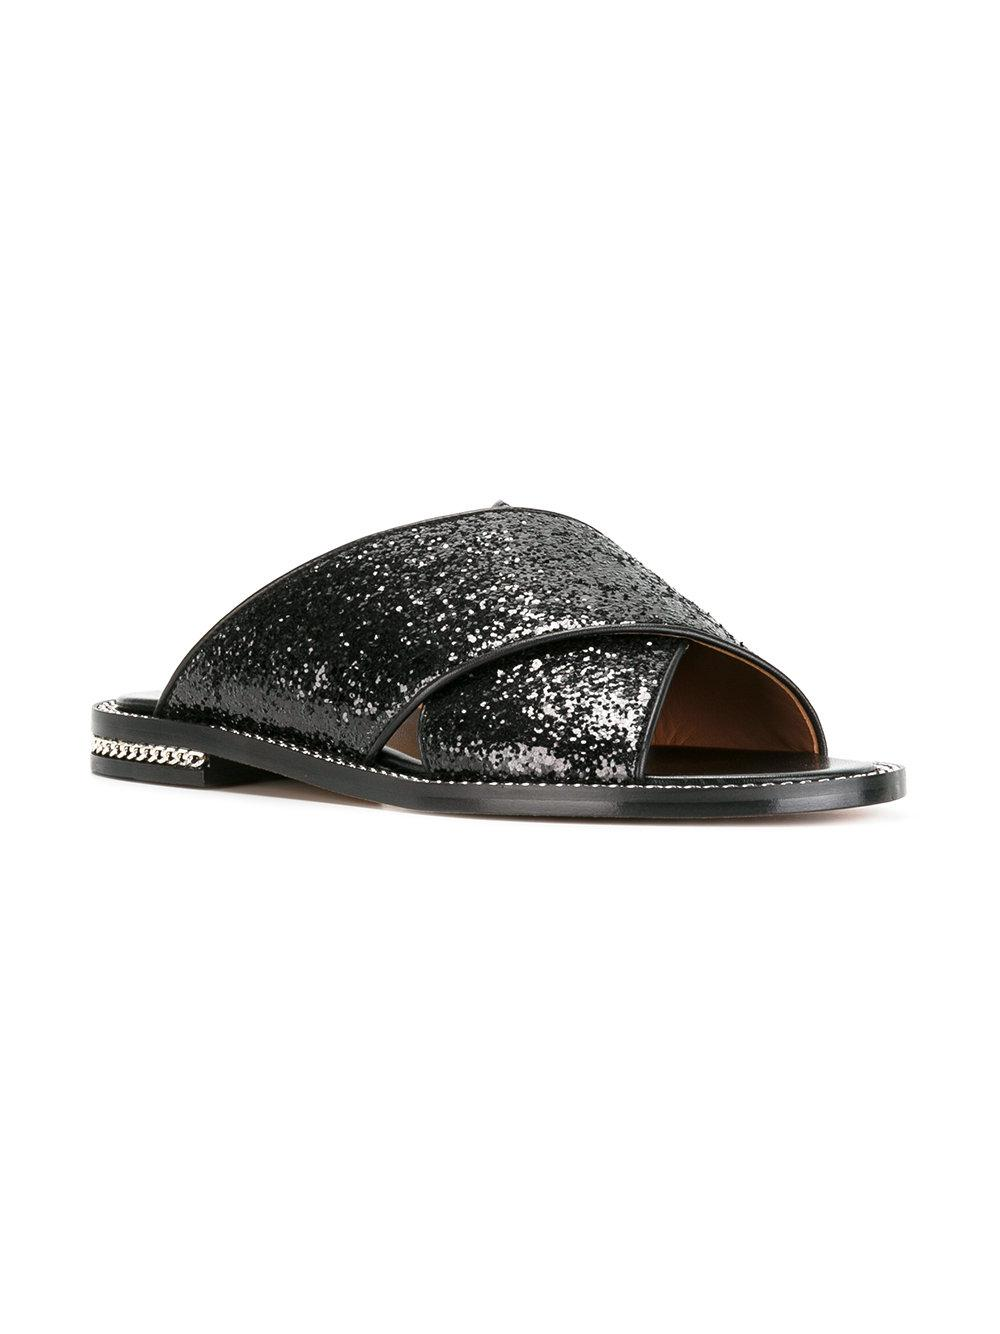 Givenchy Sequin chain flat sandal rdlJ69i